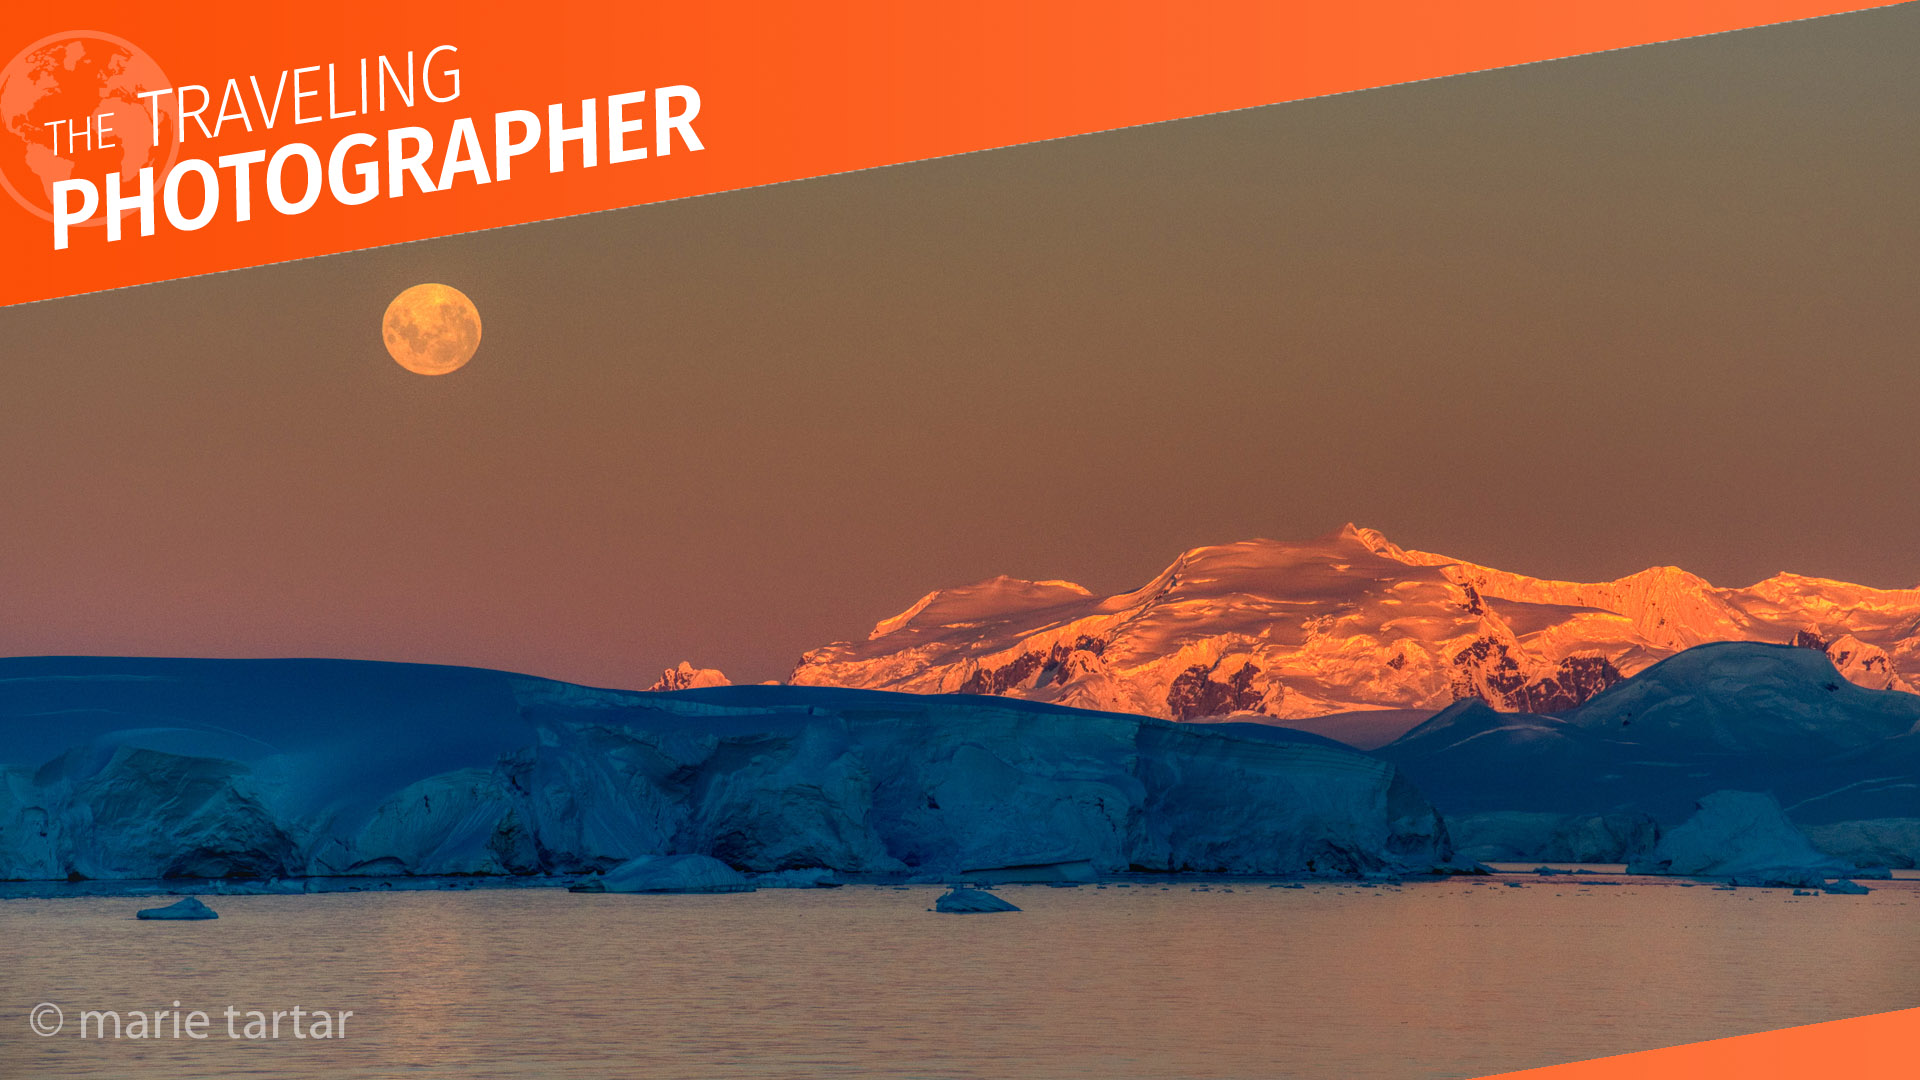 The Traveling Photographer: Off to Antarctica | Photofocus